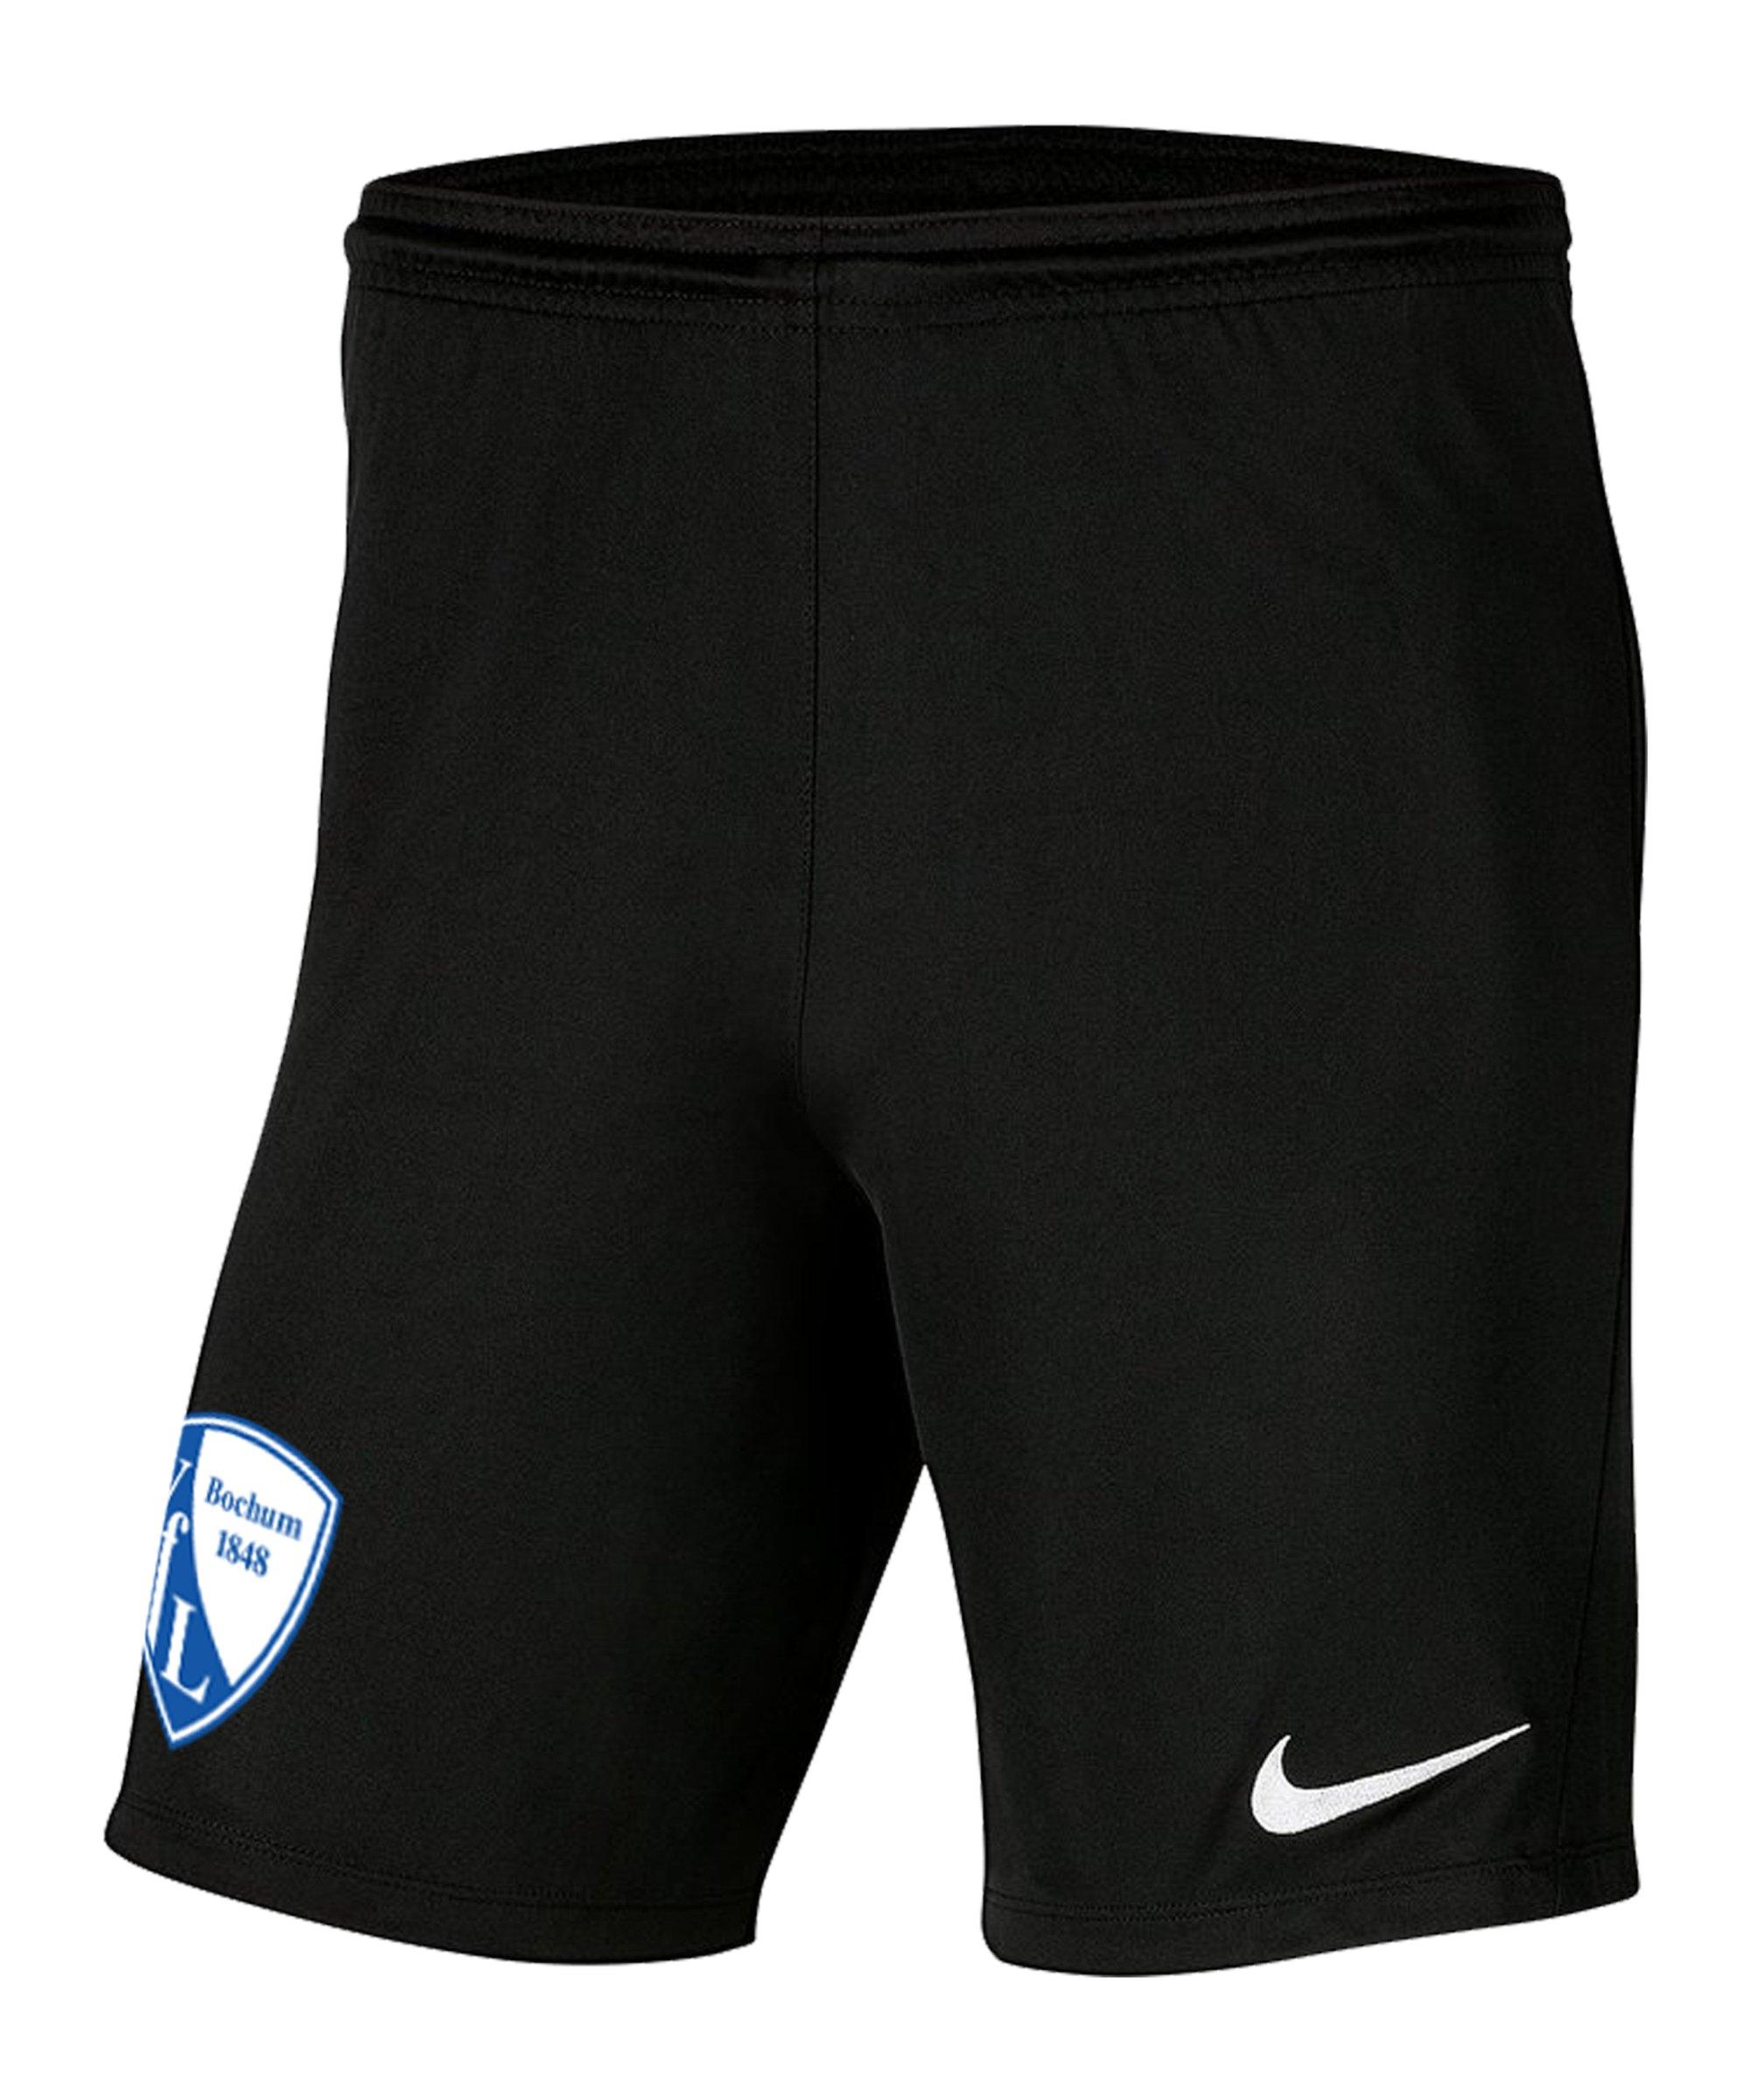 Nike VfL Bochum TW Short 20/21 Schwarz F010 - schwarz